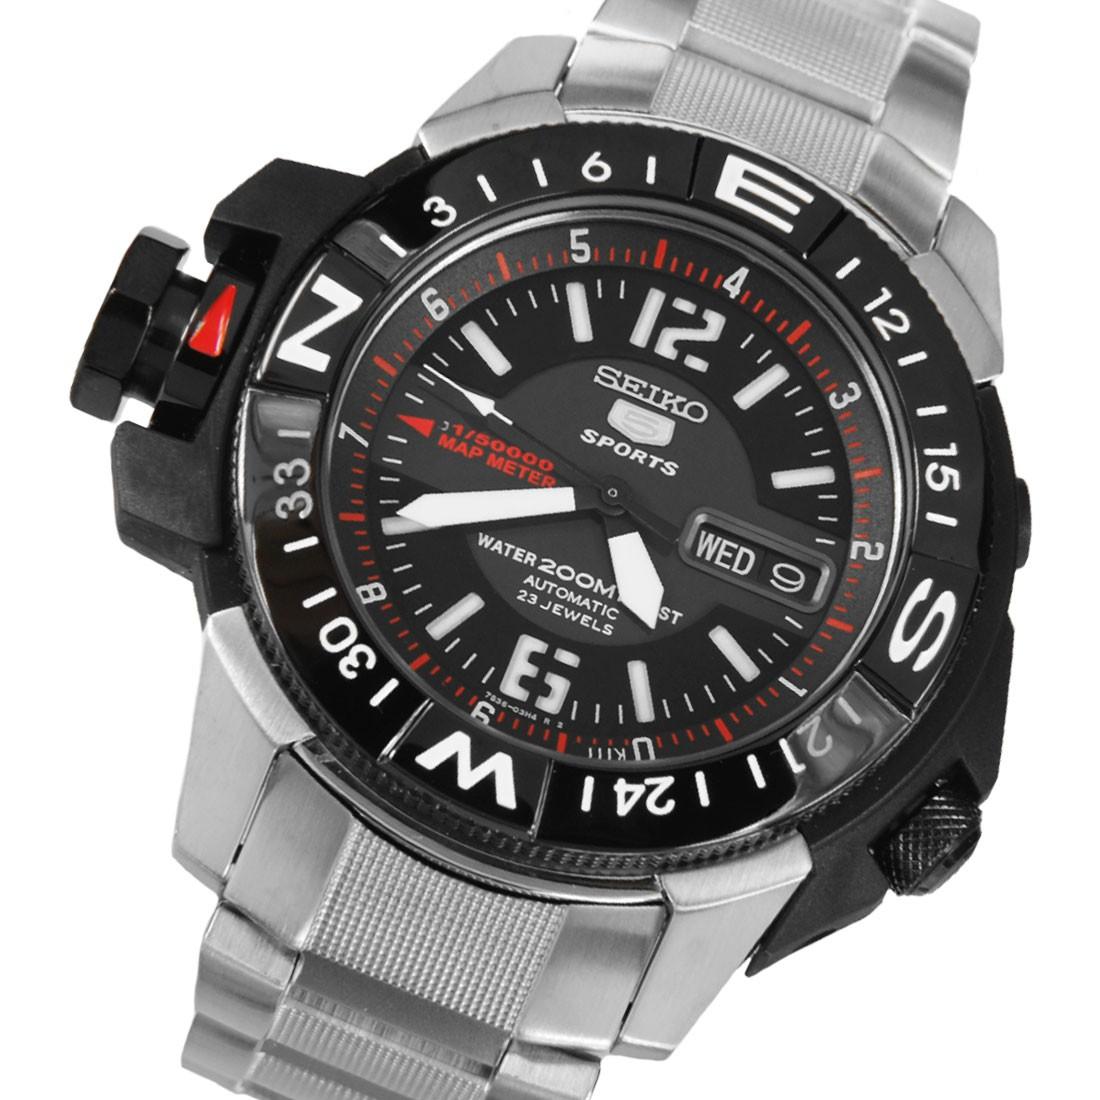 cf4711727 Seiko 5 Sports Automatic 23 Jewels Map Meter Compass SKZ229 SKZ229K ...